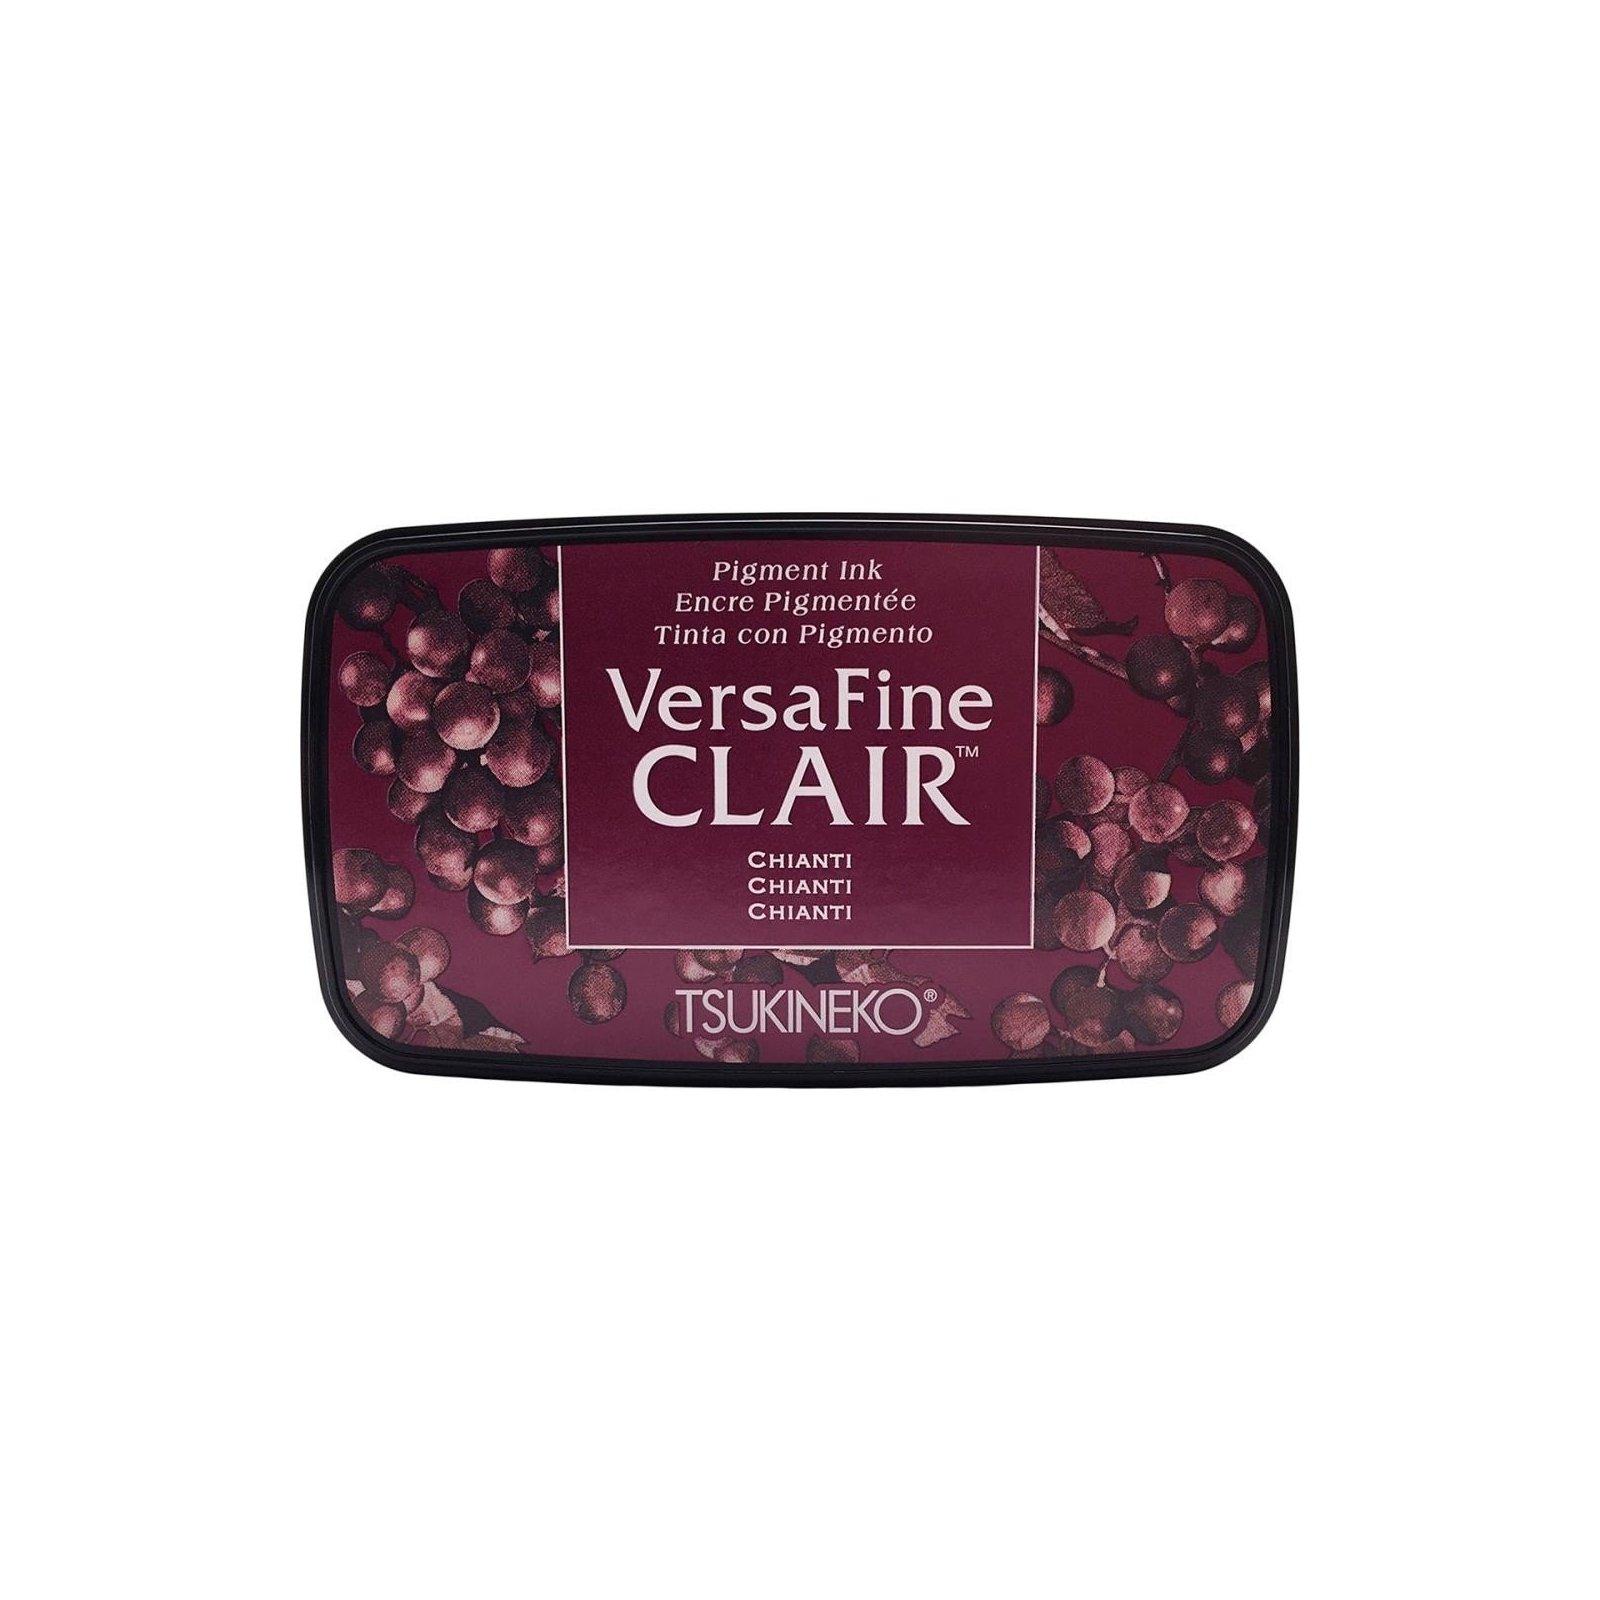 Grand encreur Versafine Clair - Lie de vin - Chianti - Tsukineko